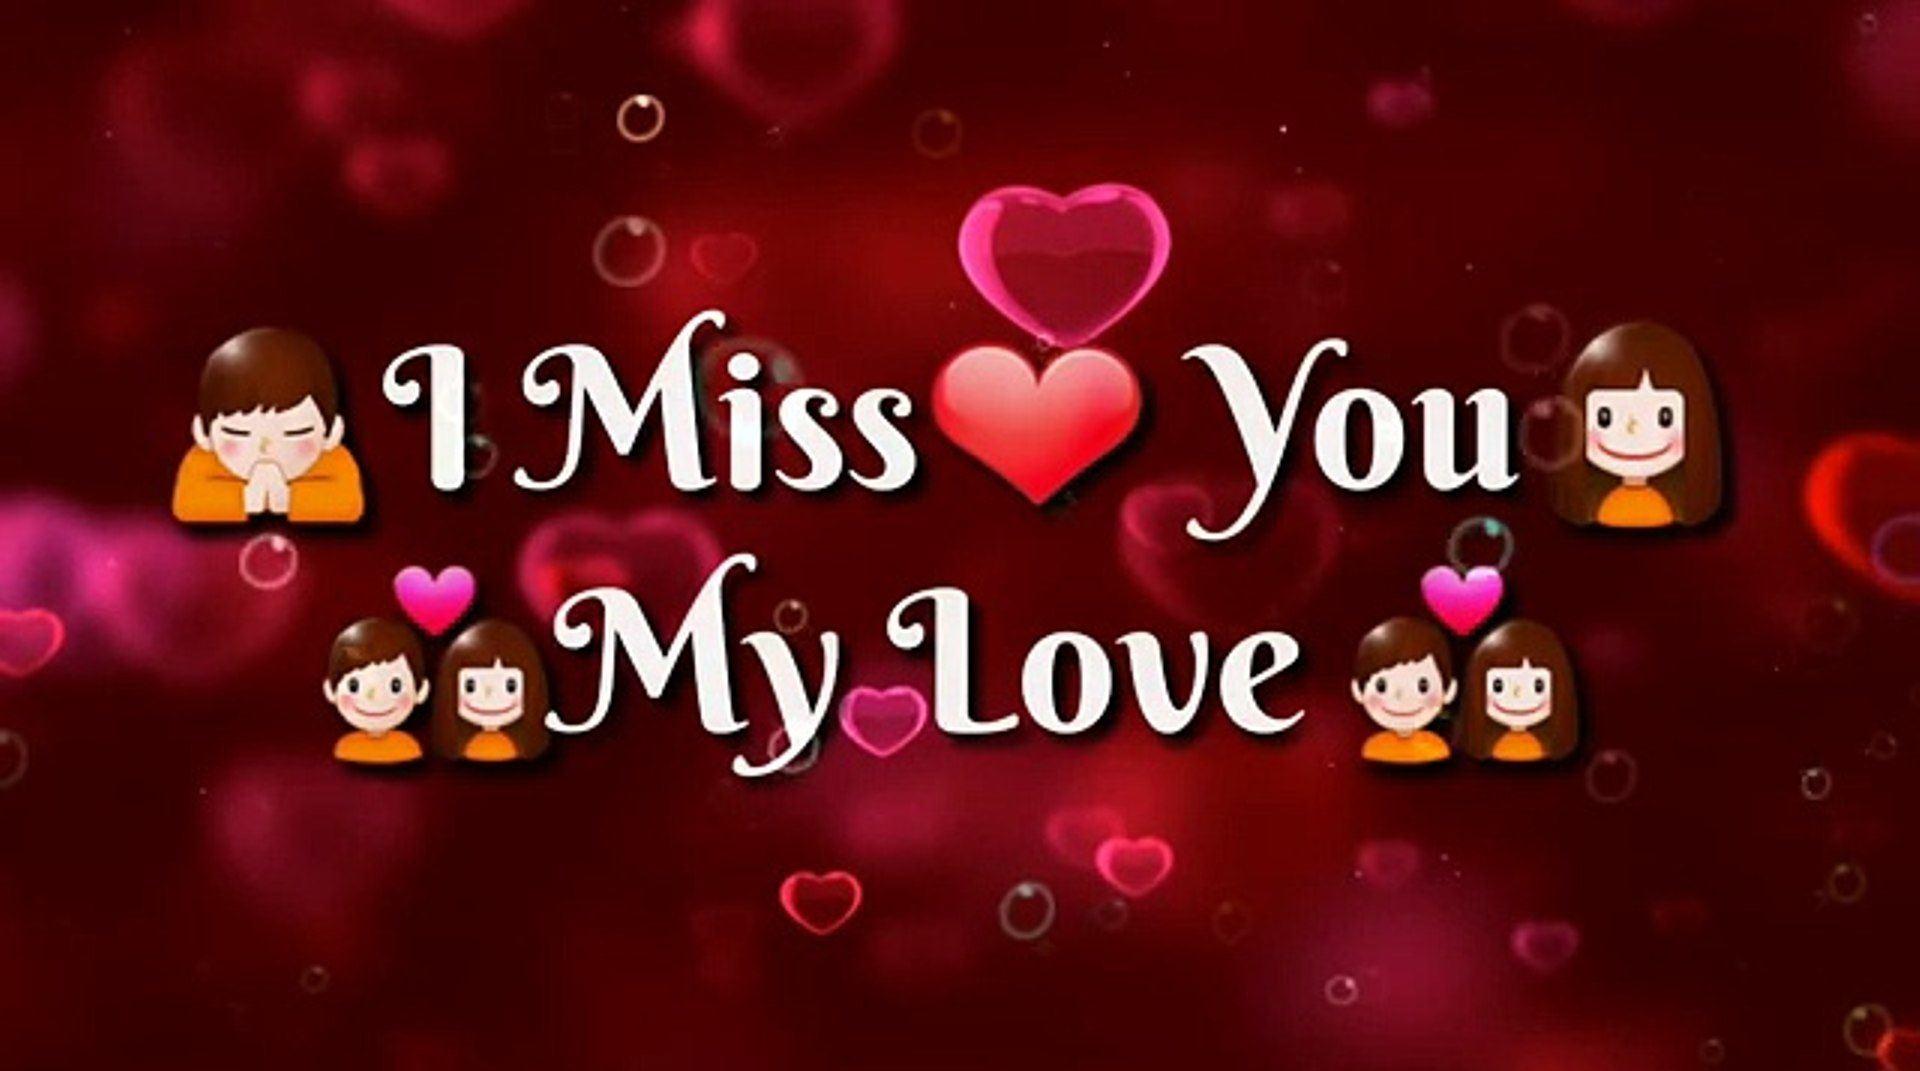 Miss You Love Pics Miss You My Love Raj 1920x1071 Download Hd Wallpaper Wallpapertip